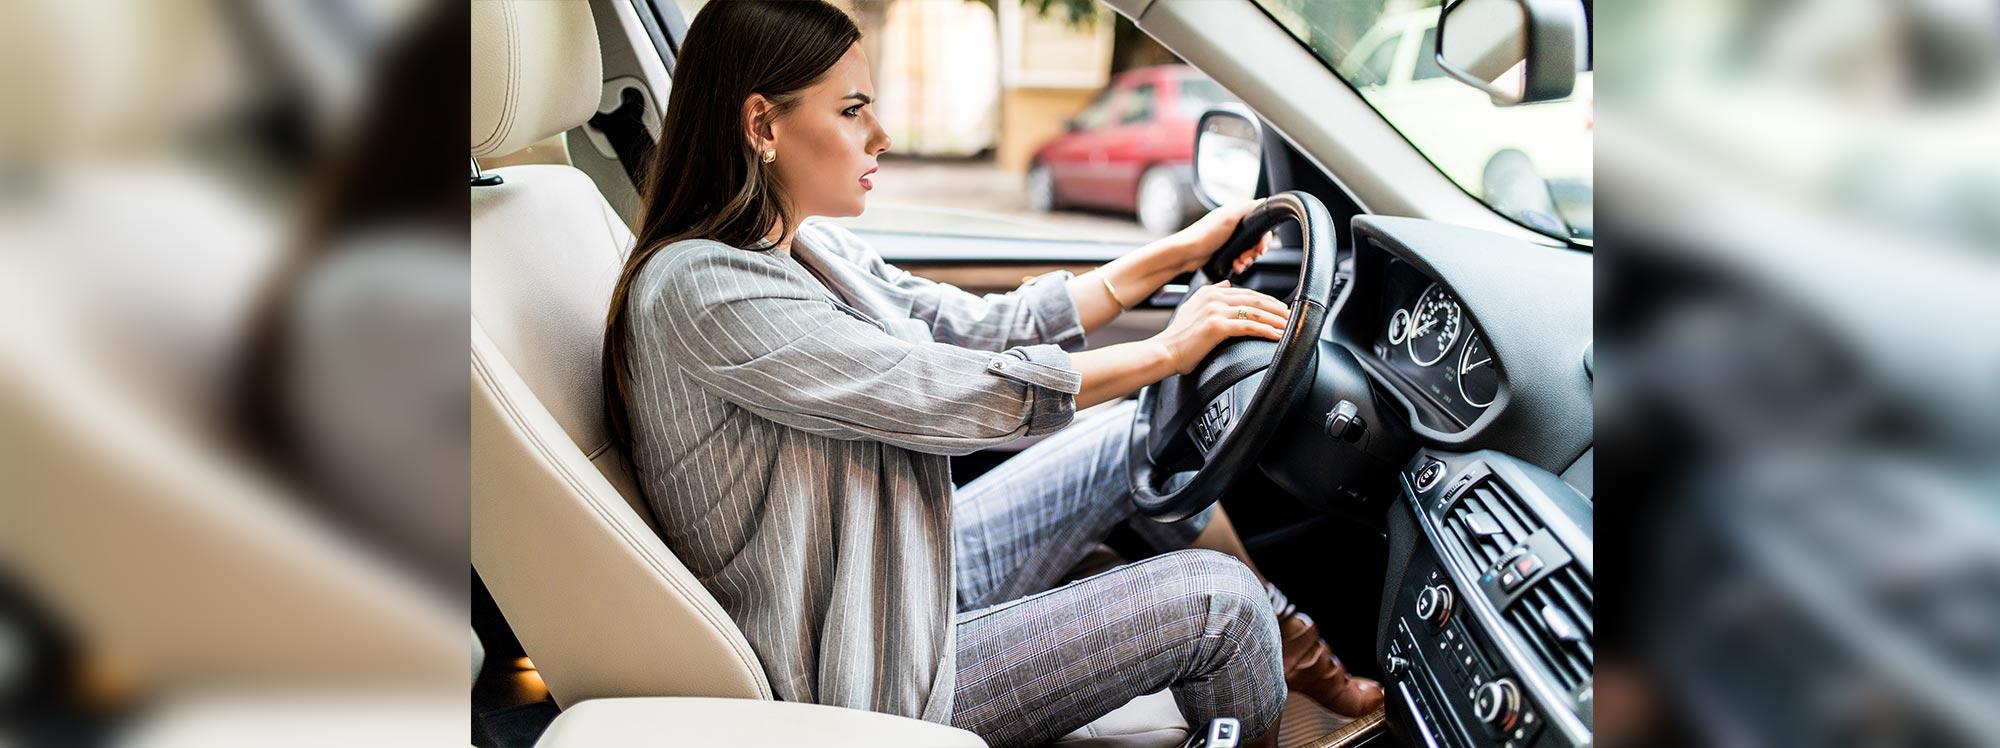 ¿Cómo se produce la ira de carretera?